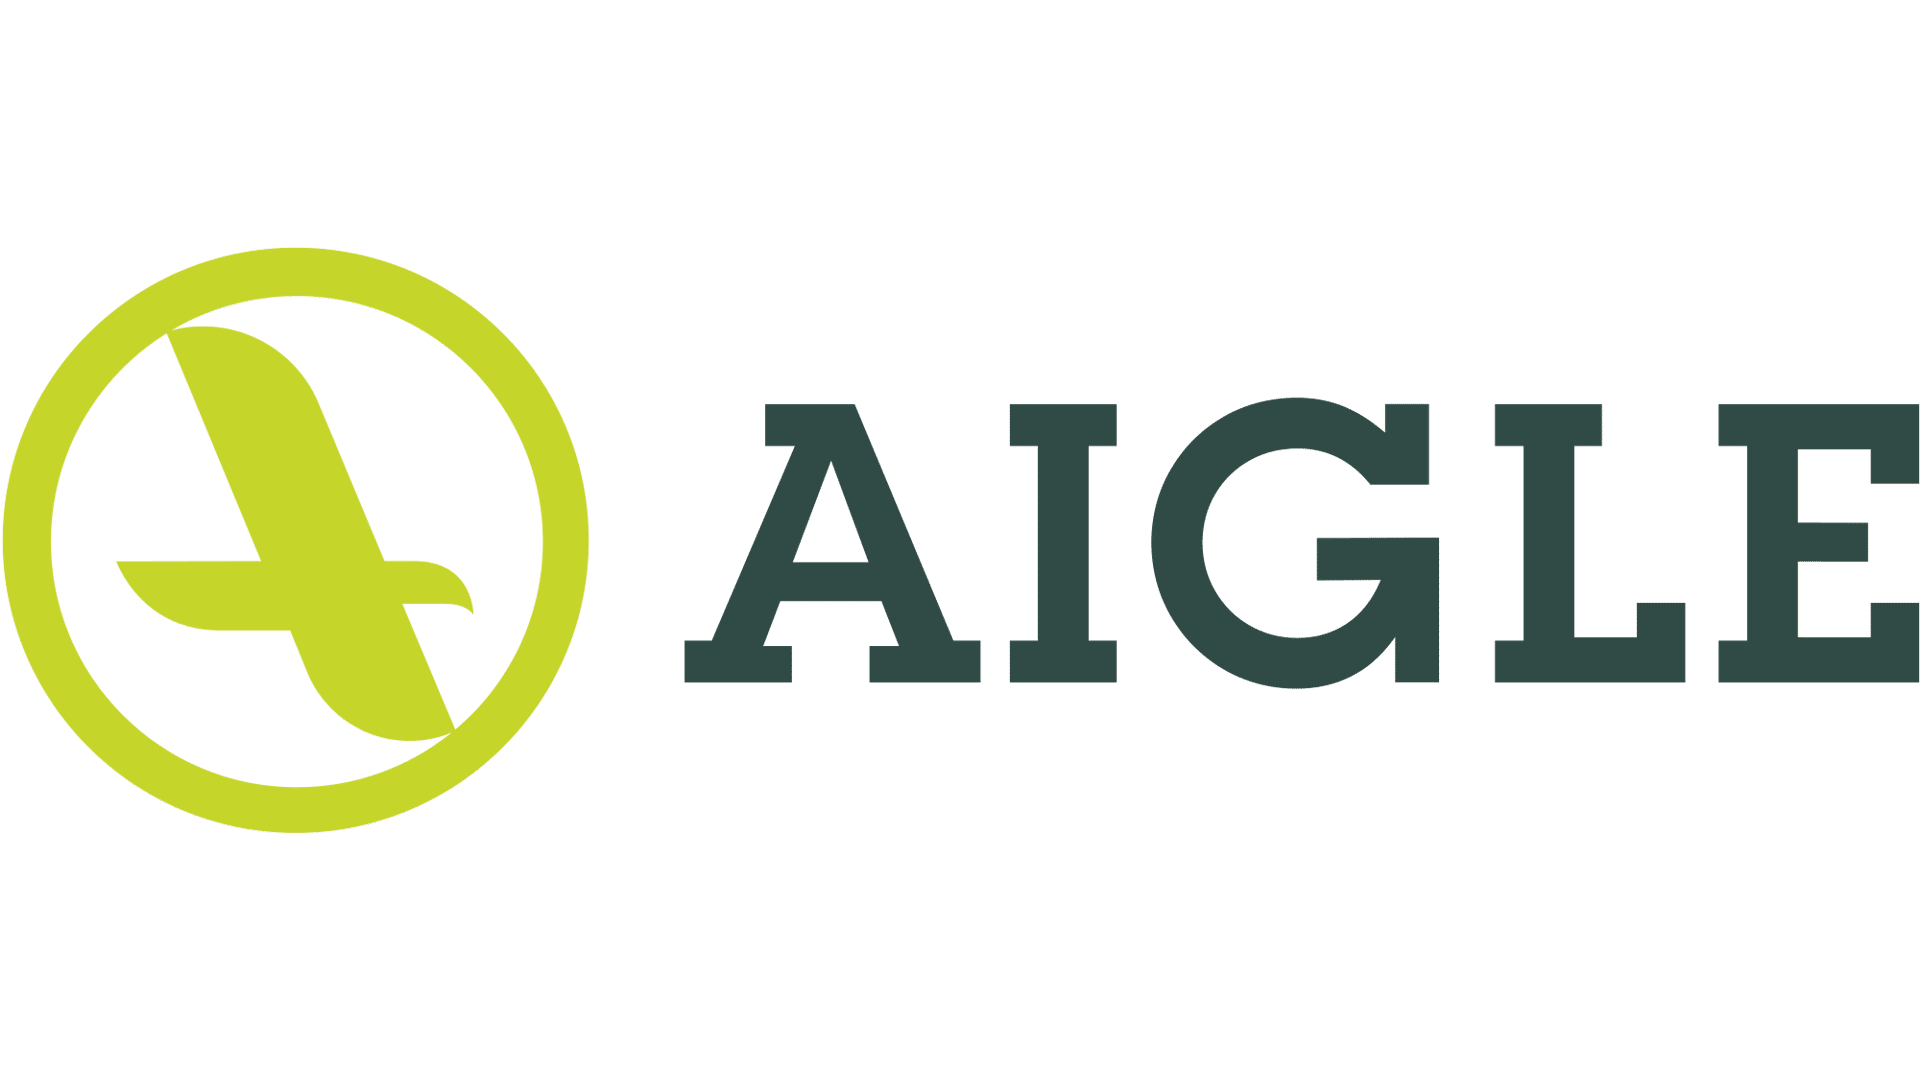 aigle logo histoire et signification evolution symbole aigle